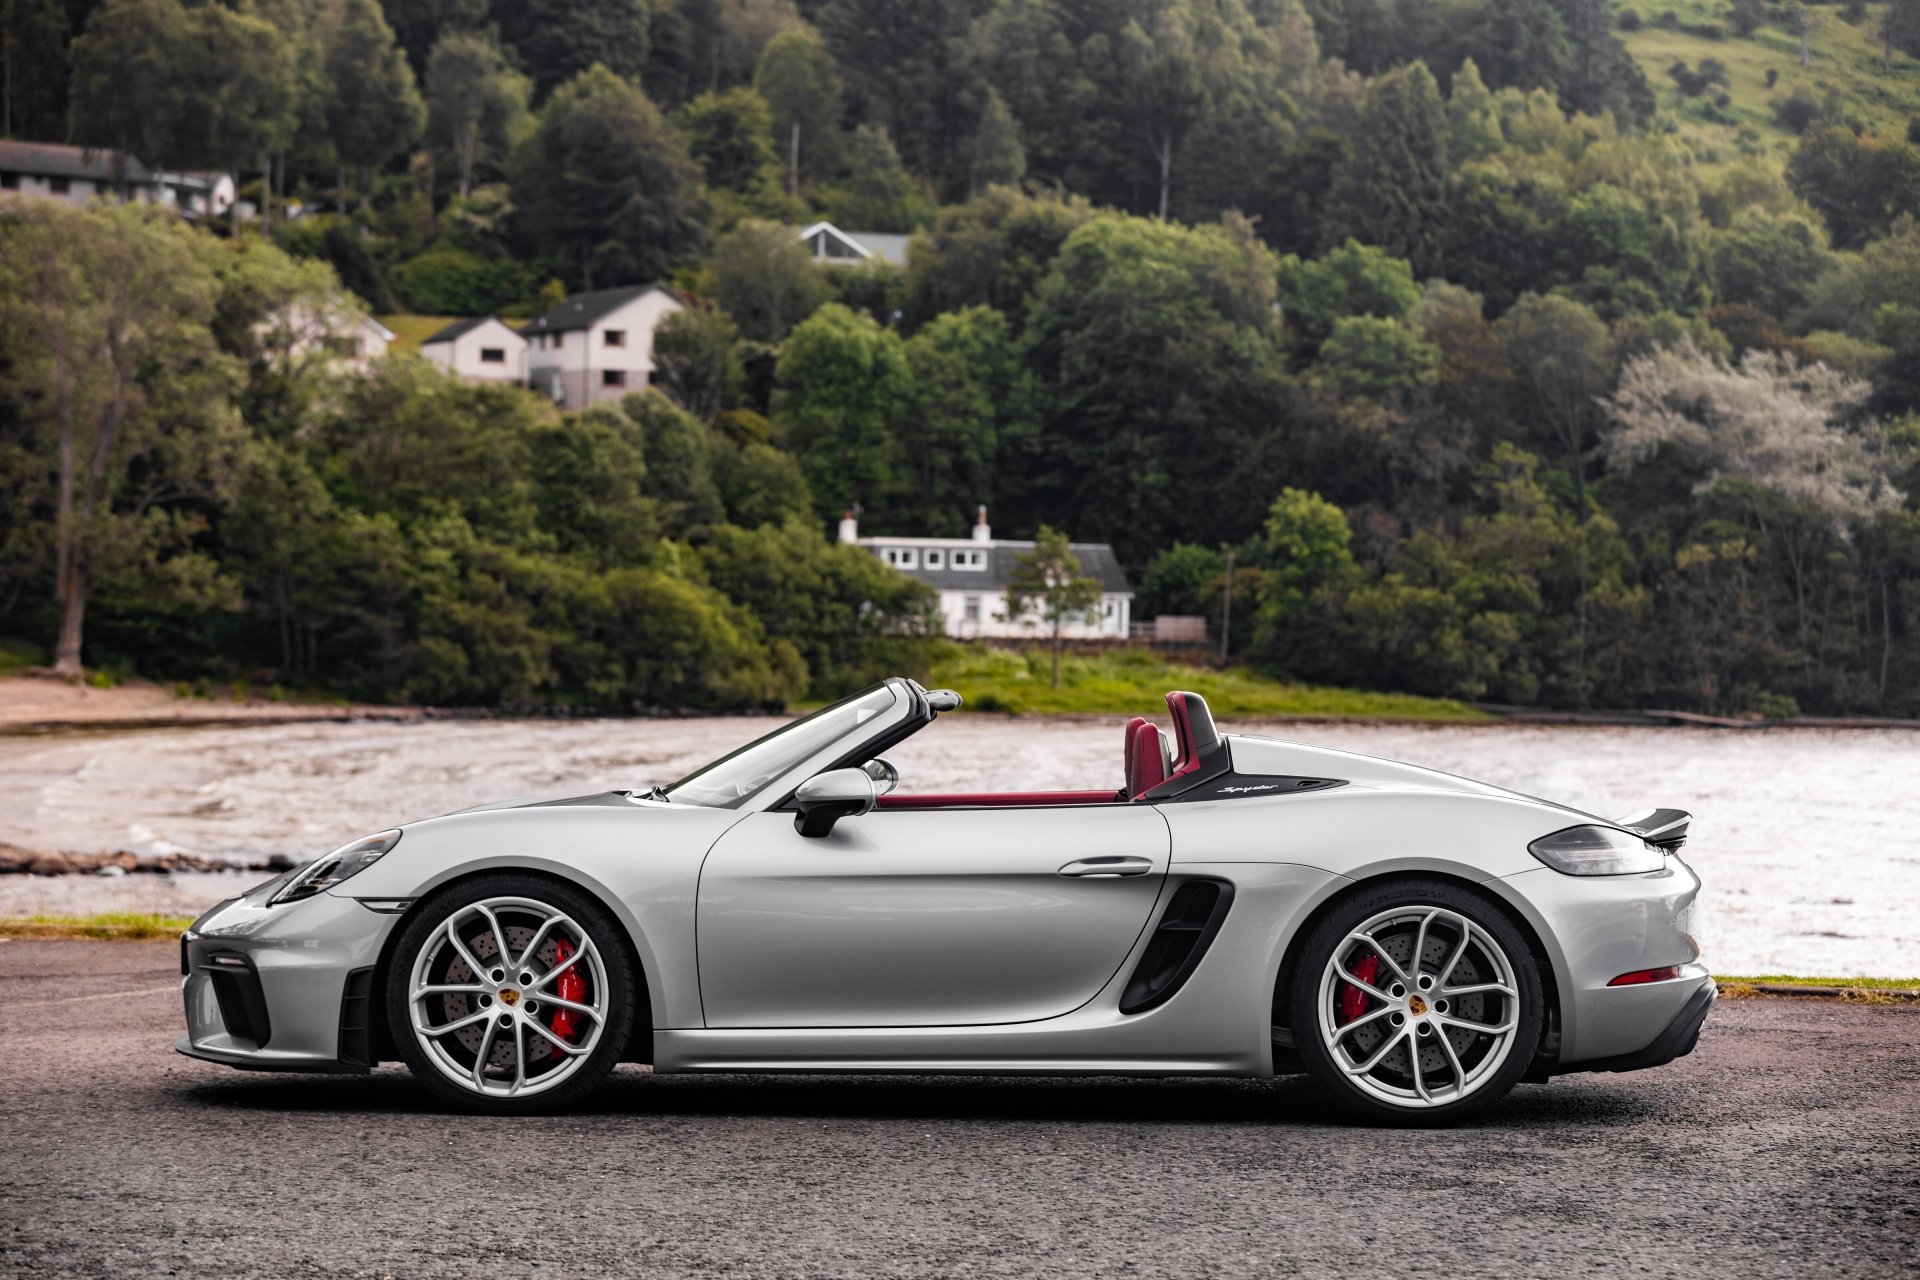 21 Porsche 718 Spyder Hd Wallpapers Background Images Wallpaper Abyss